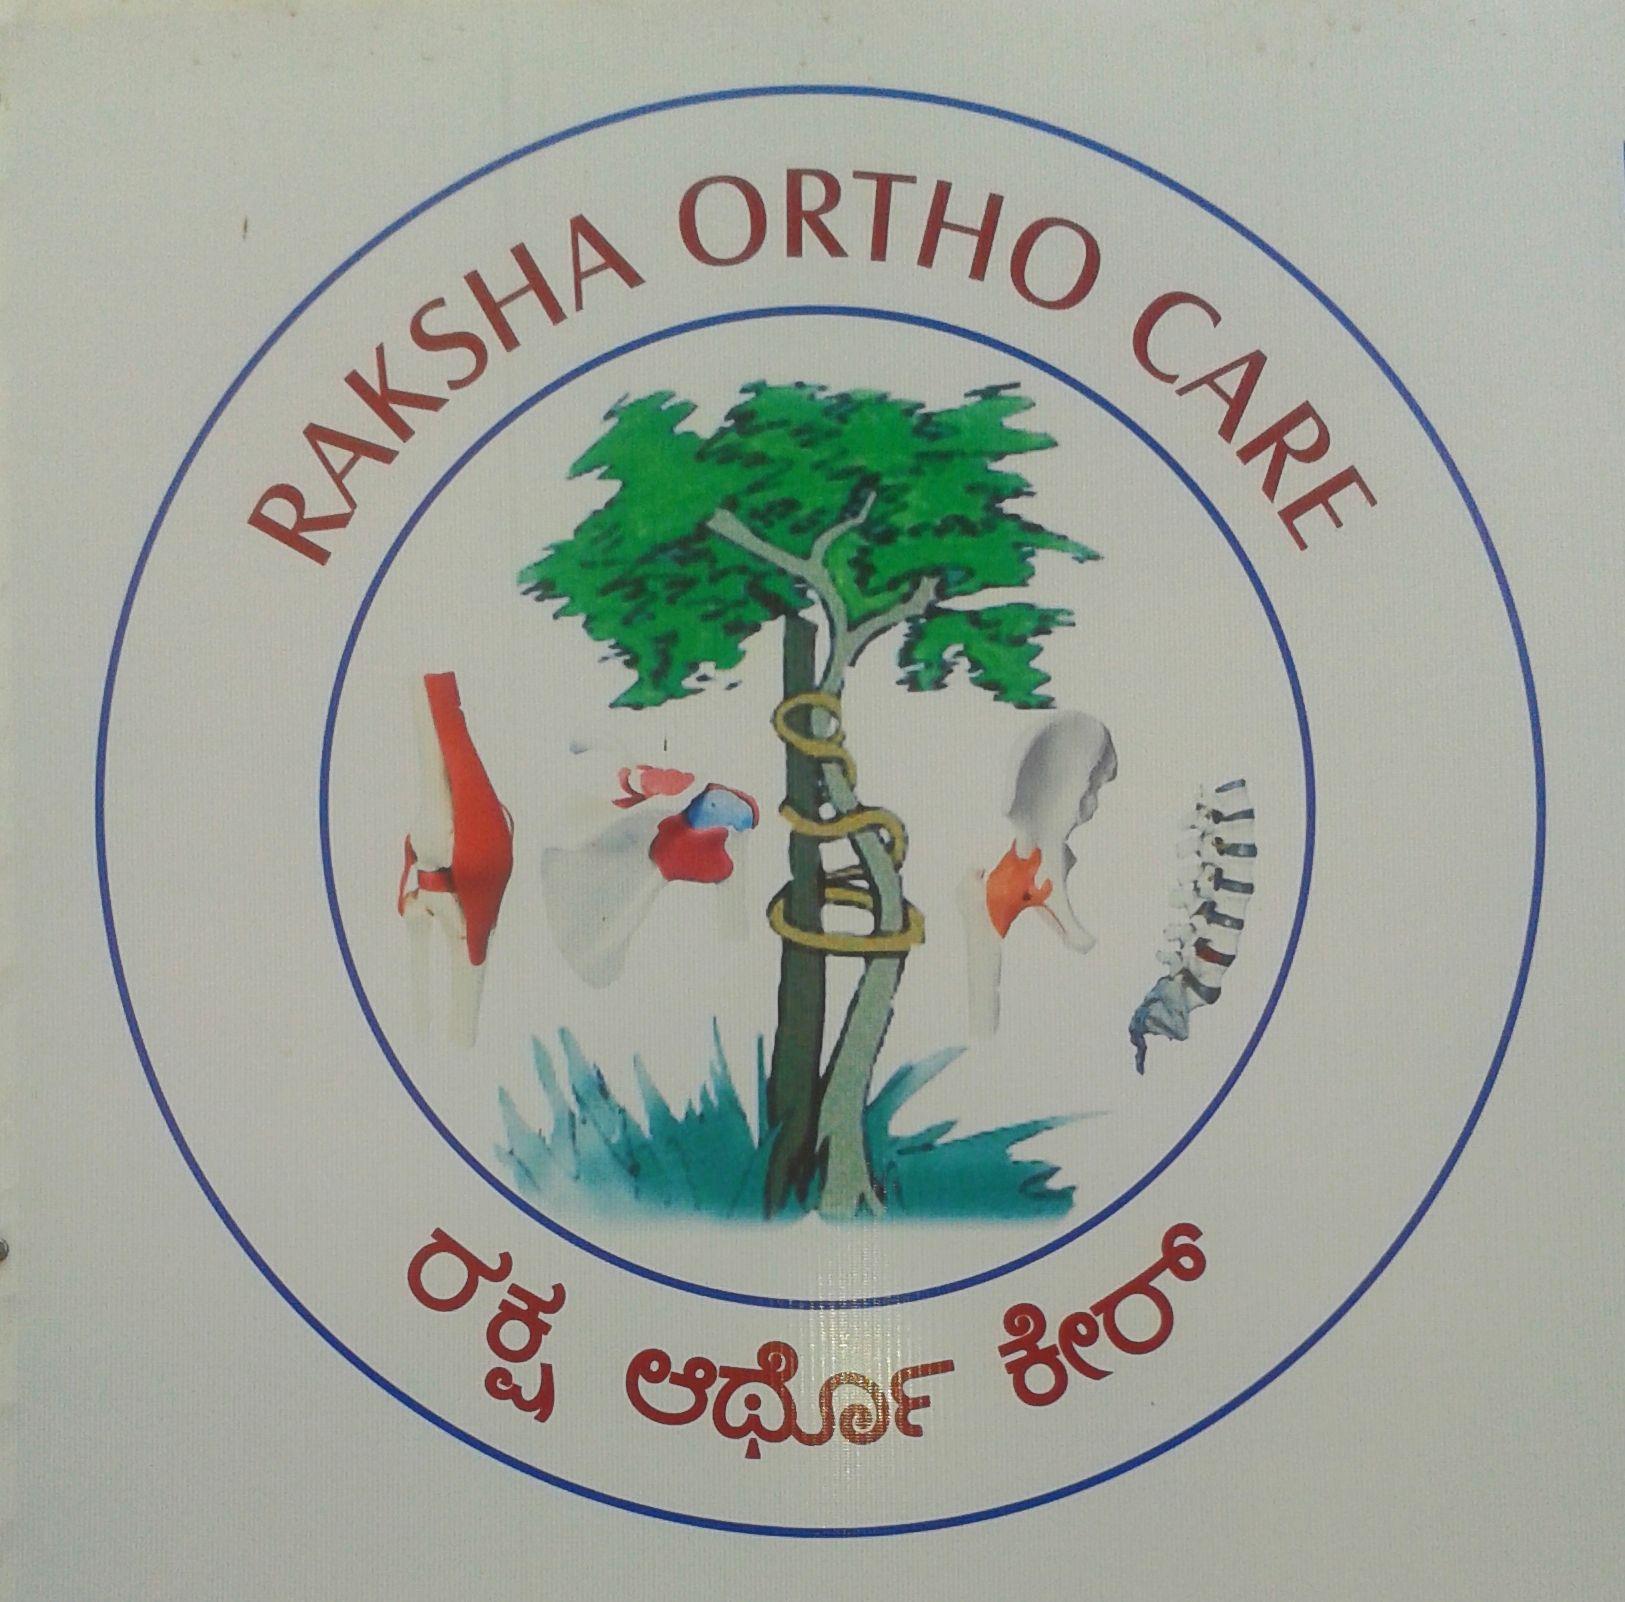 Raksha Ortho Care.